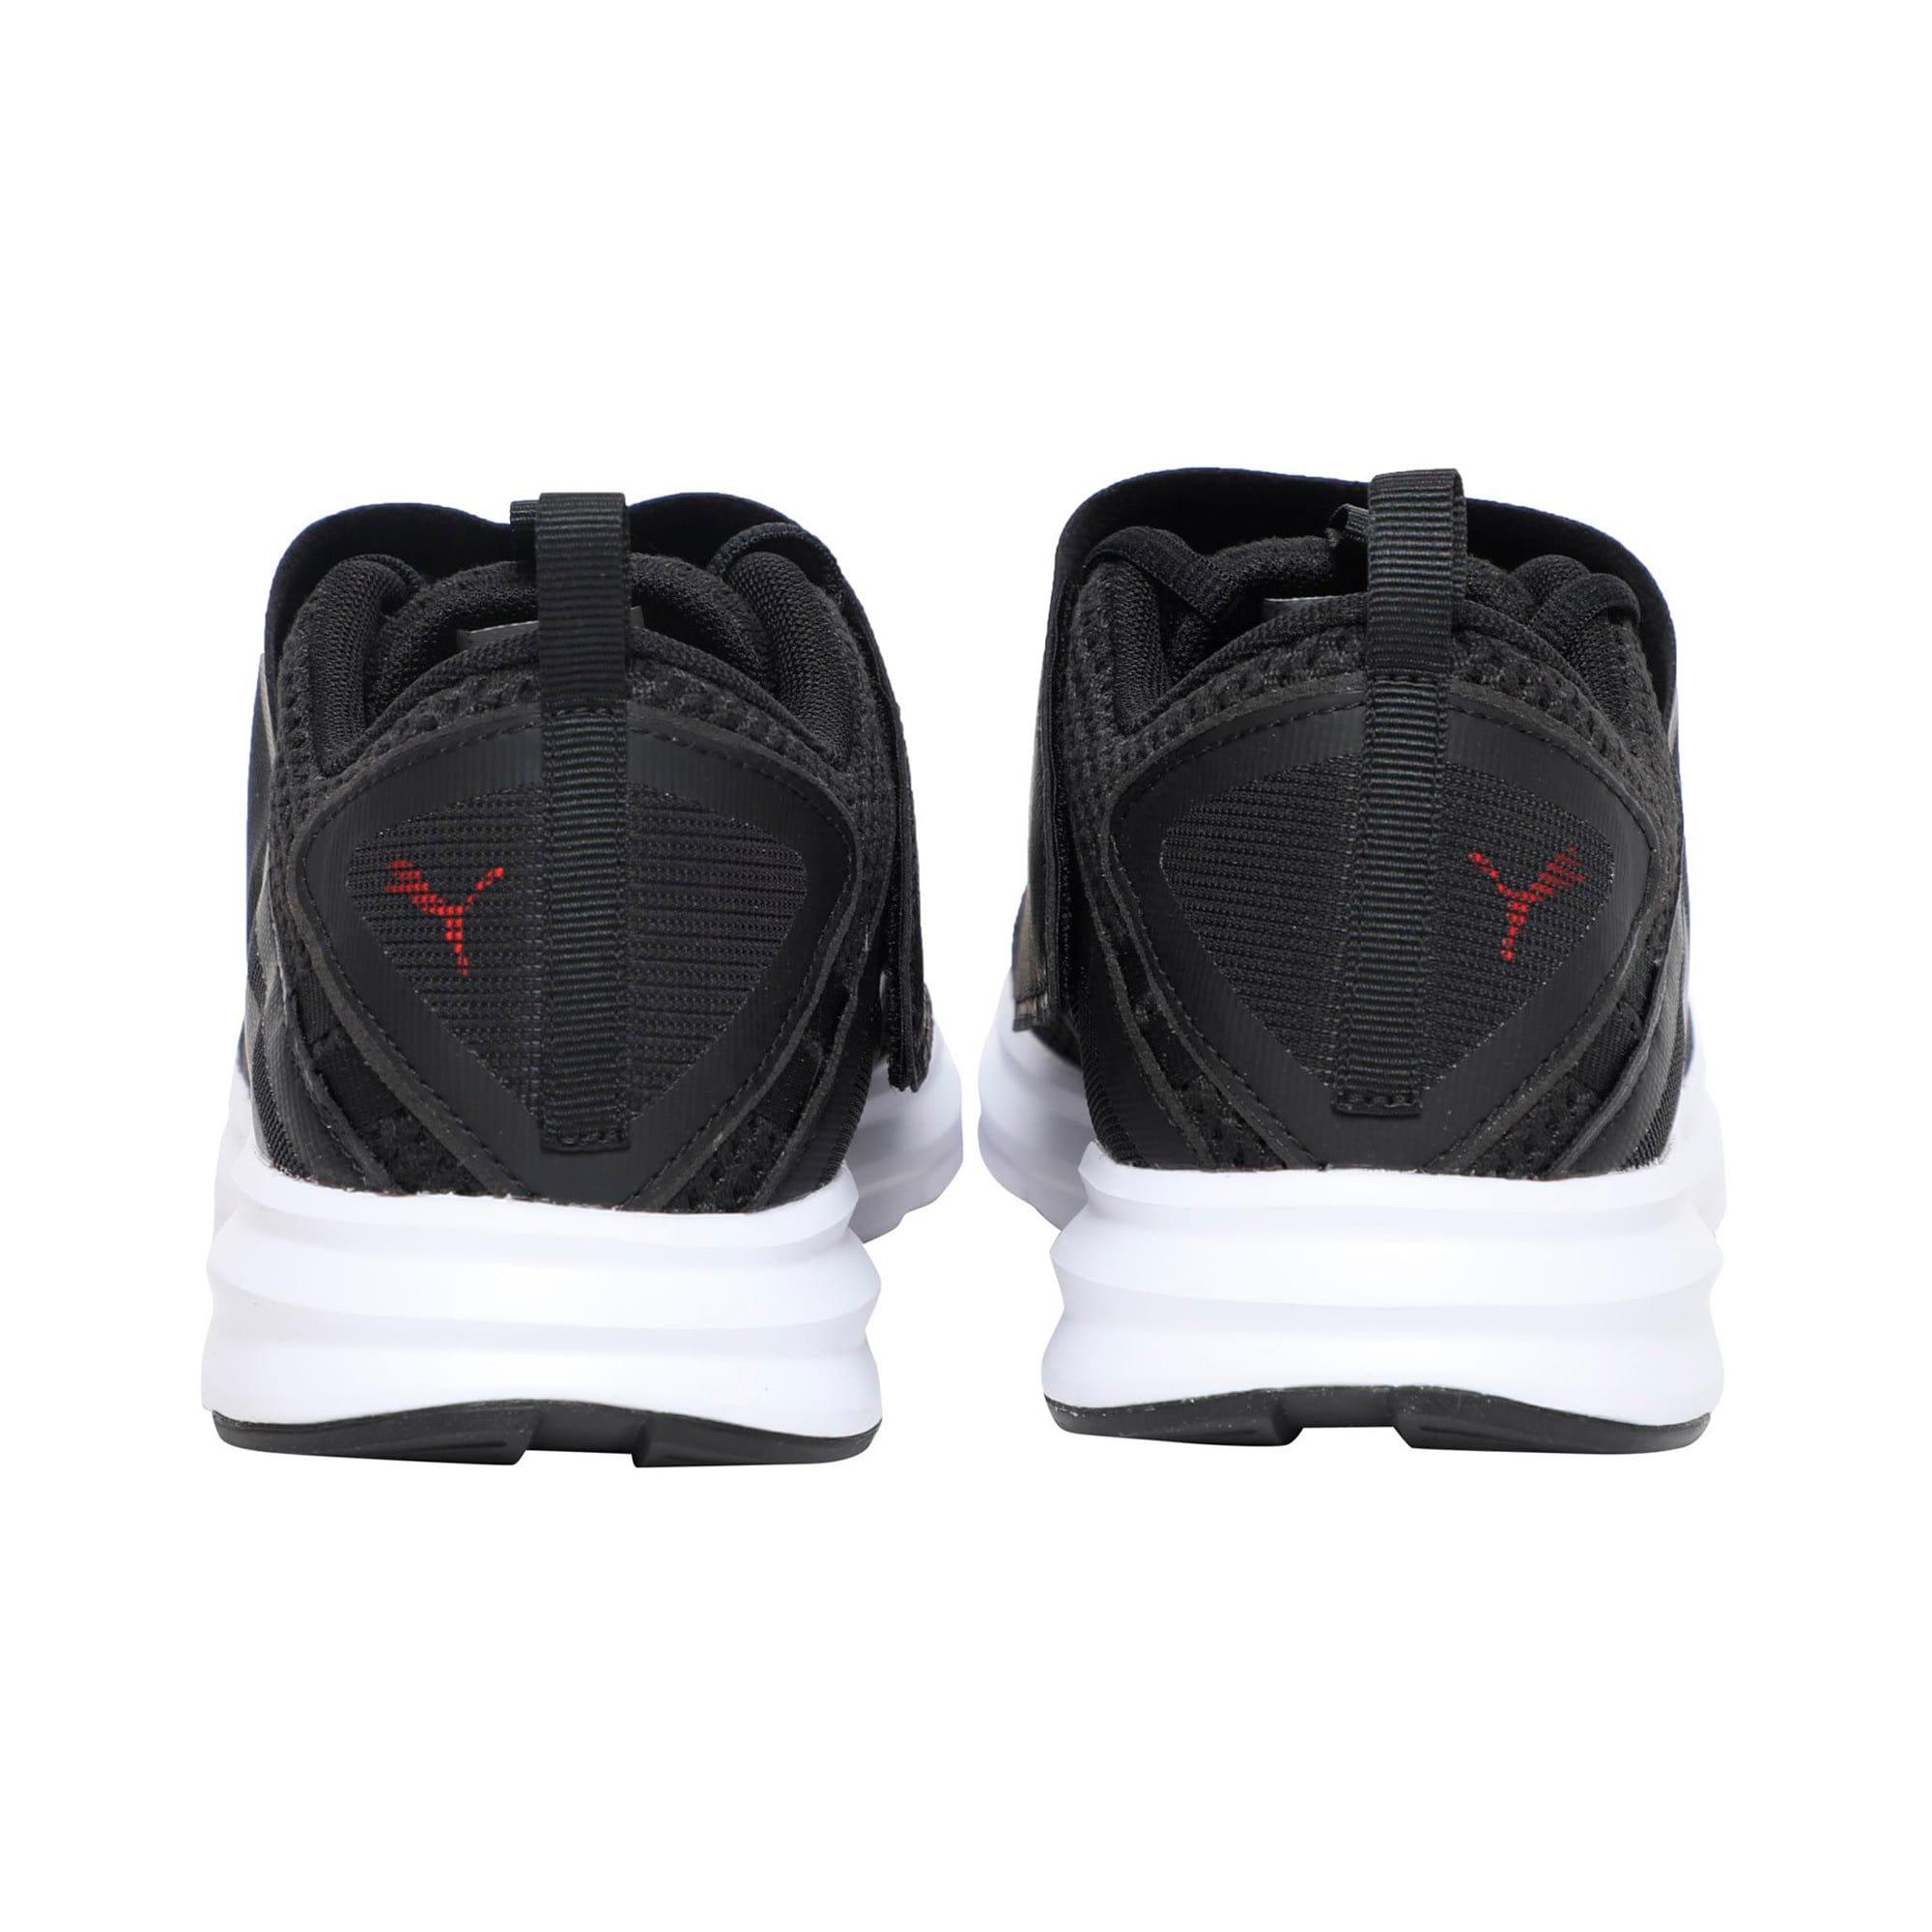 Thumbnail 3 of Enzo Strap Mesh Men's Running Shoes, Puma Black-Flame Scarlet, medium-IND